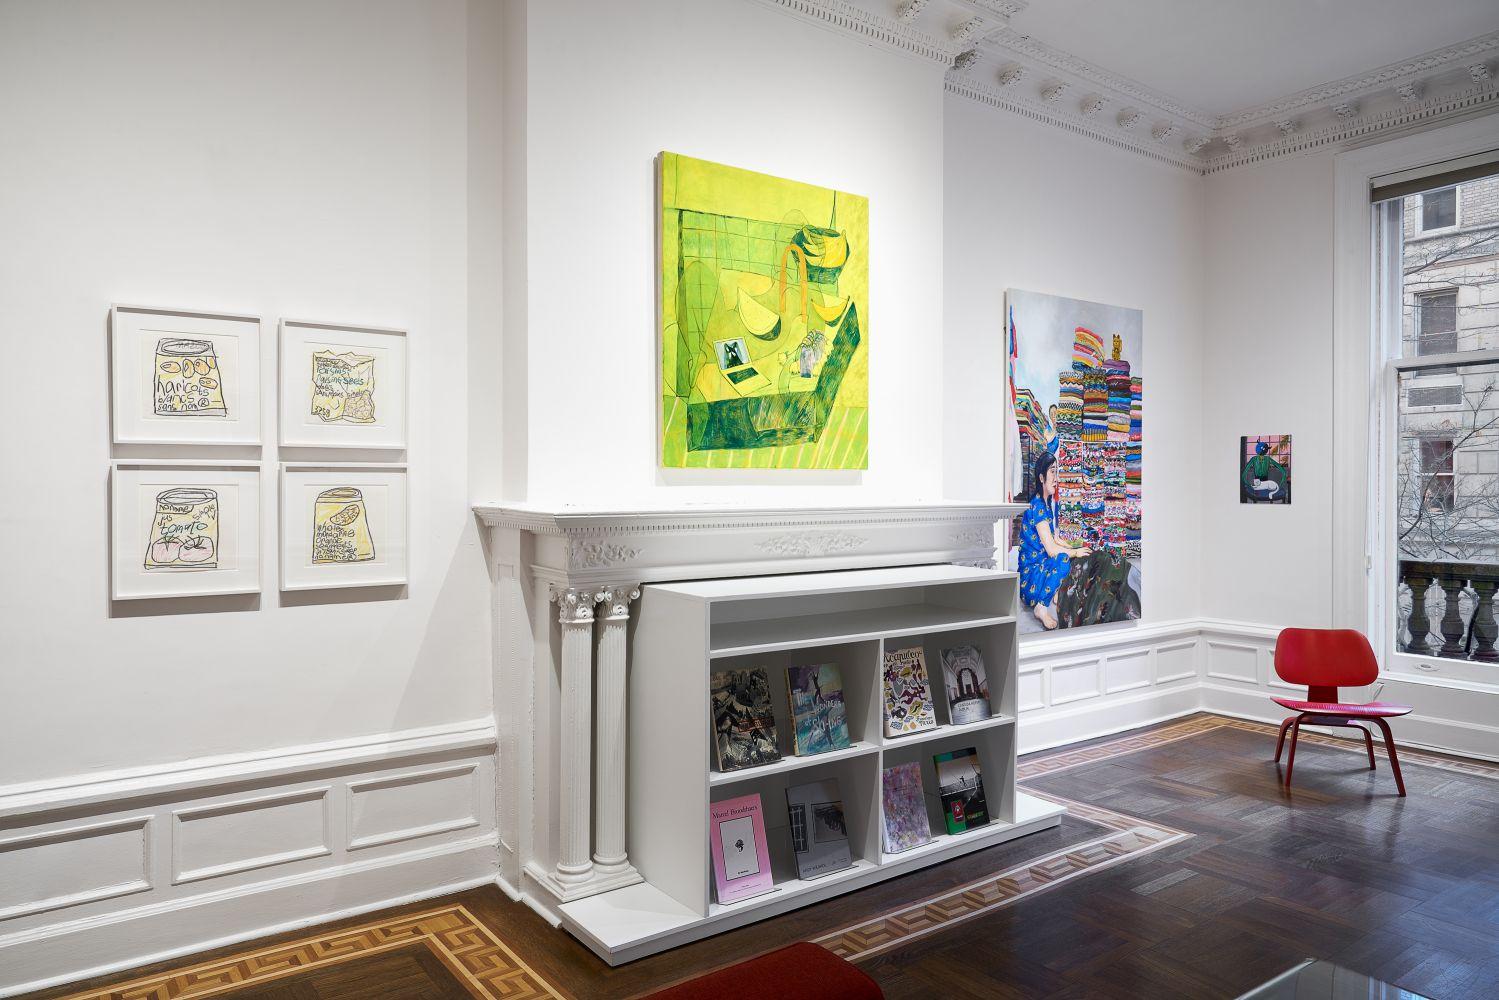 12 Artists installation view